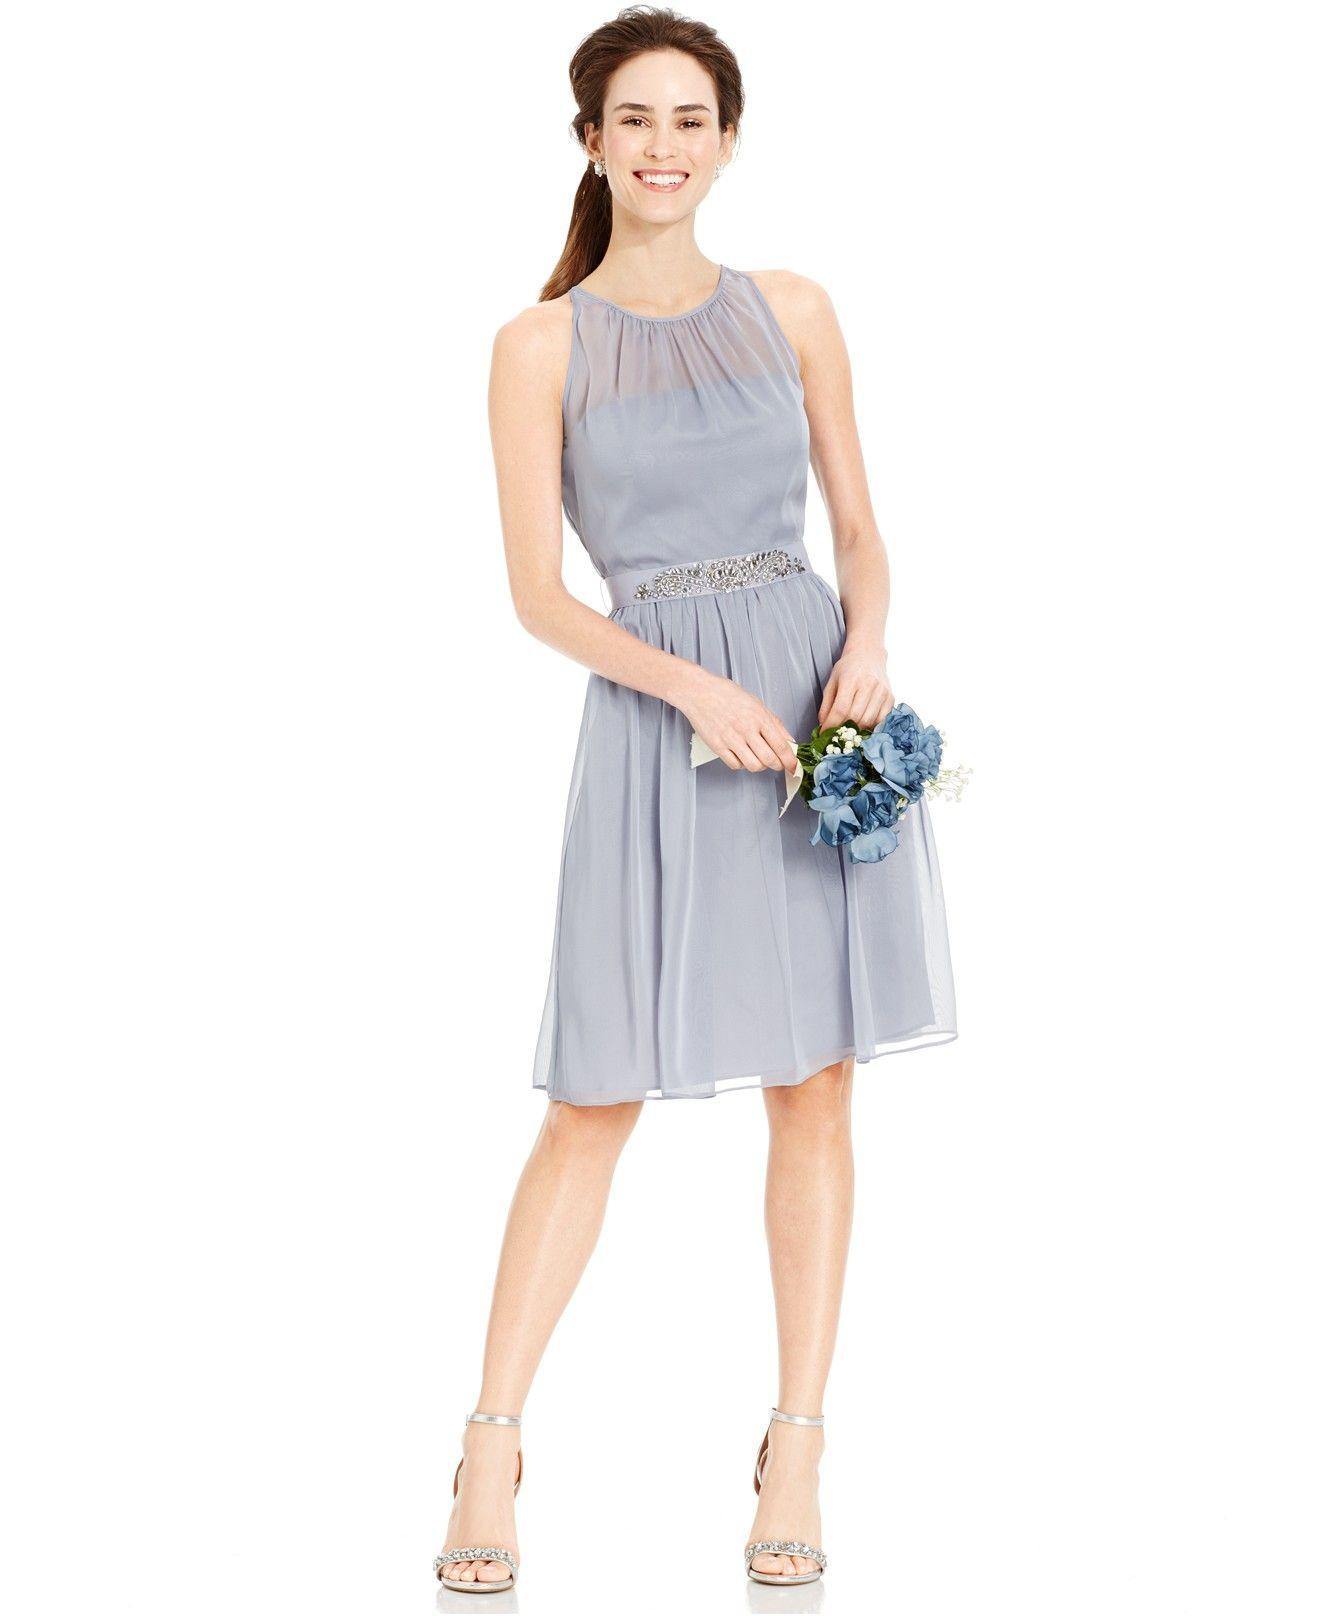 Macy S Wedding Day Dresses: Adrianna Papell Belted Chiffon Halter Dress